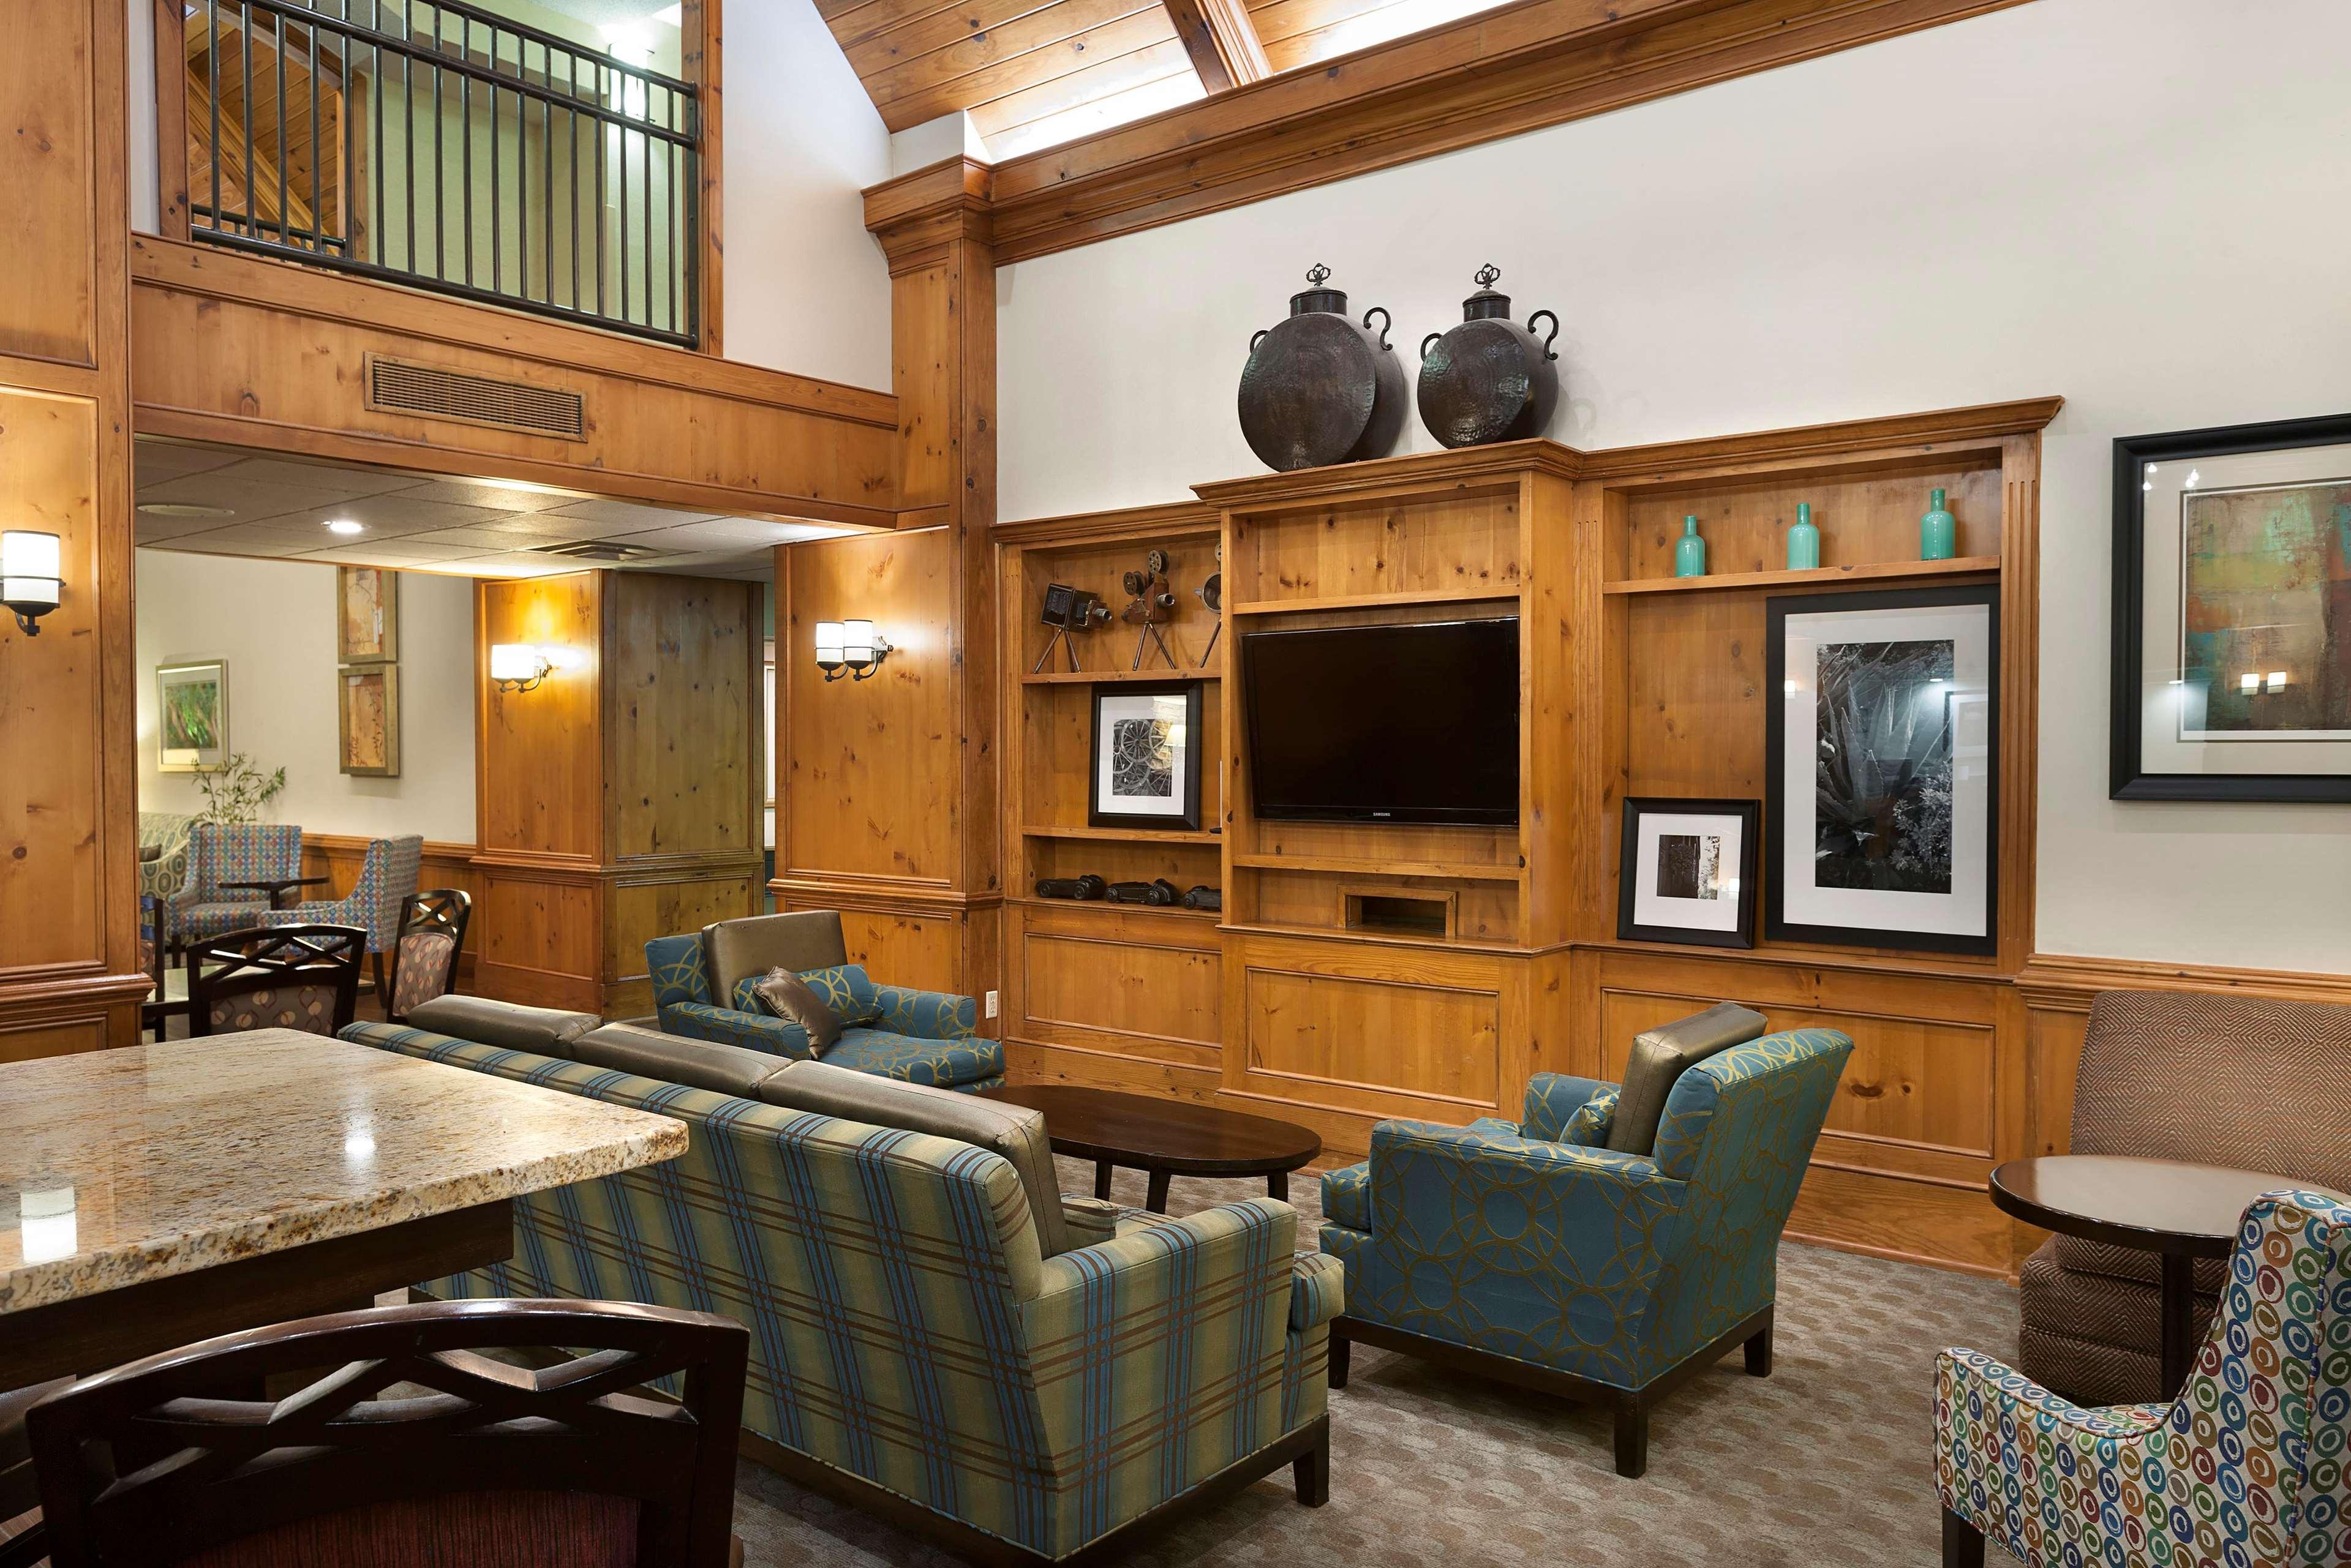 Hampton Inn & Suites Charlotte/Pineville image 35